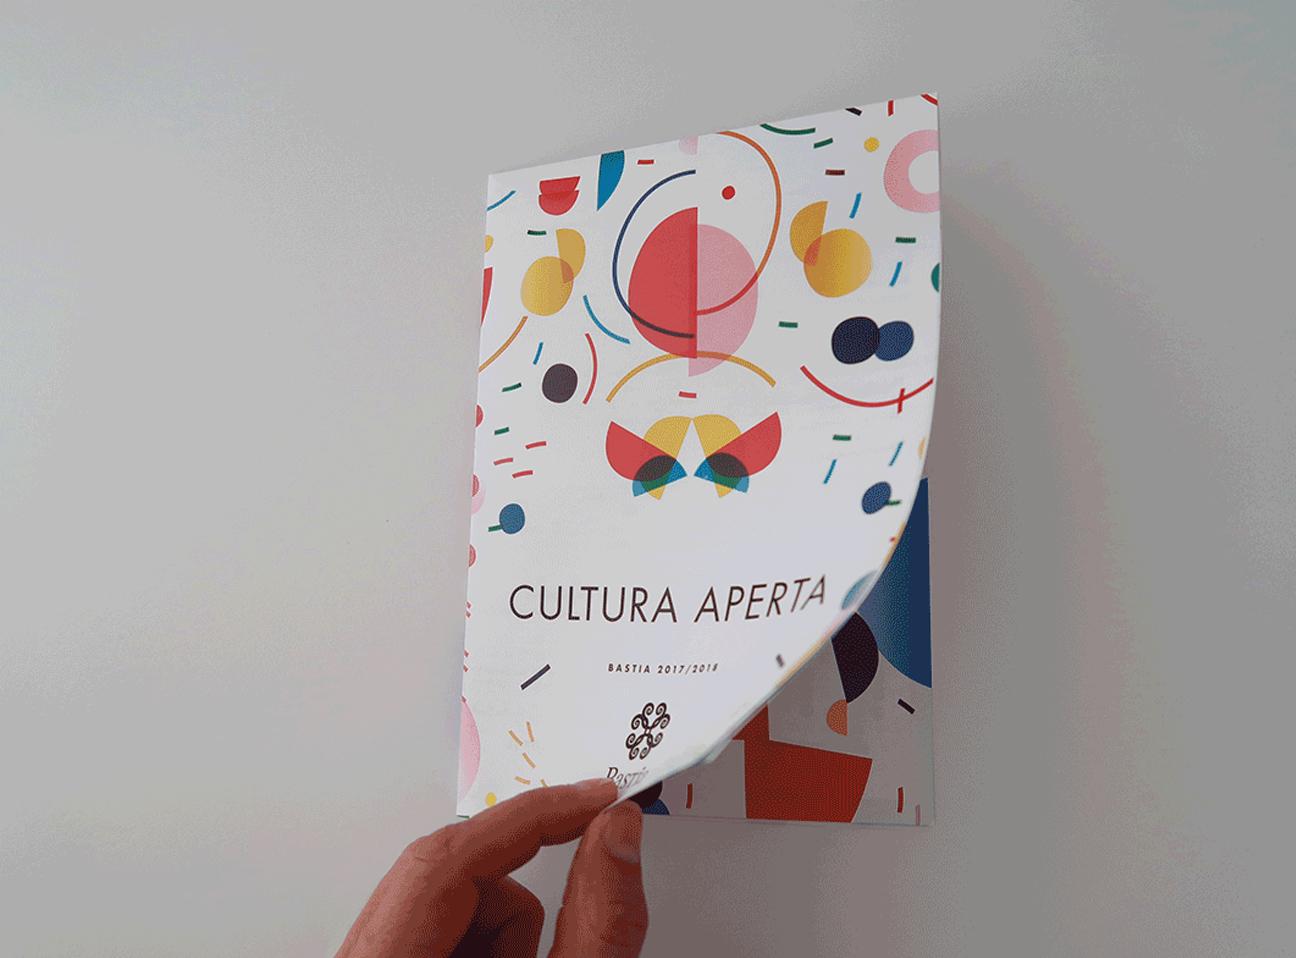 bastia cultura aperta sl1 - BASTIA CULTURA APERTA